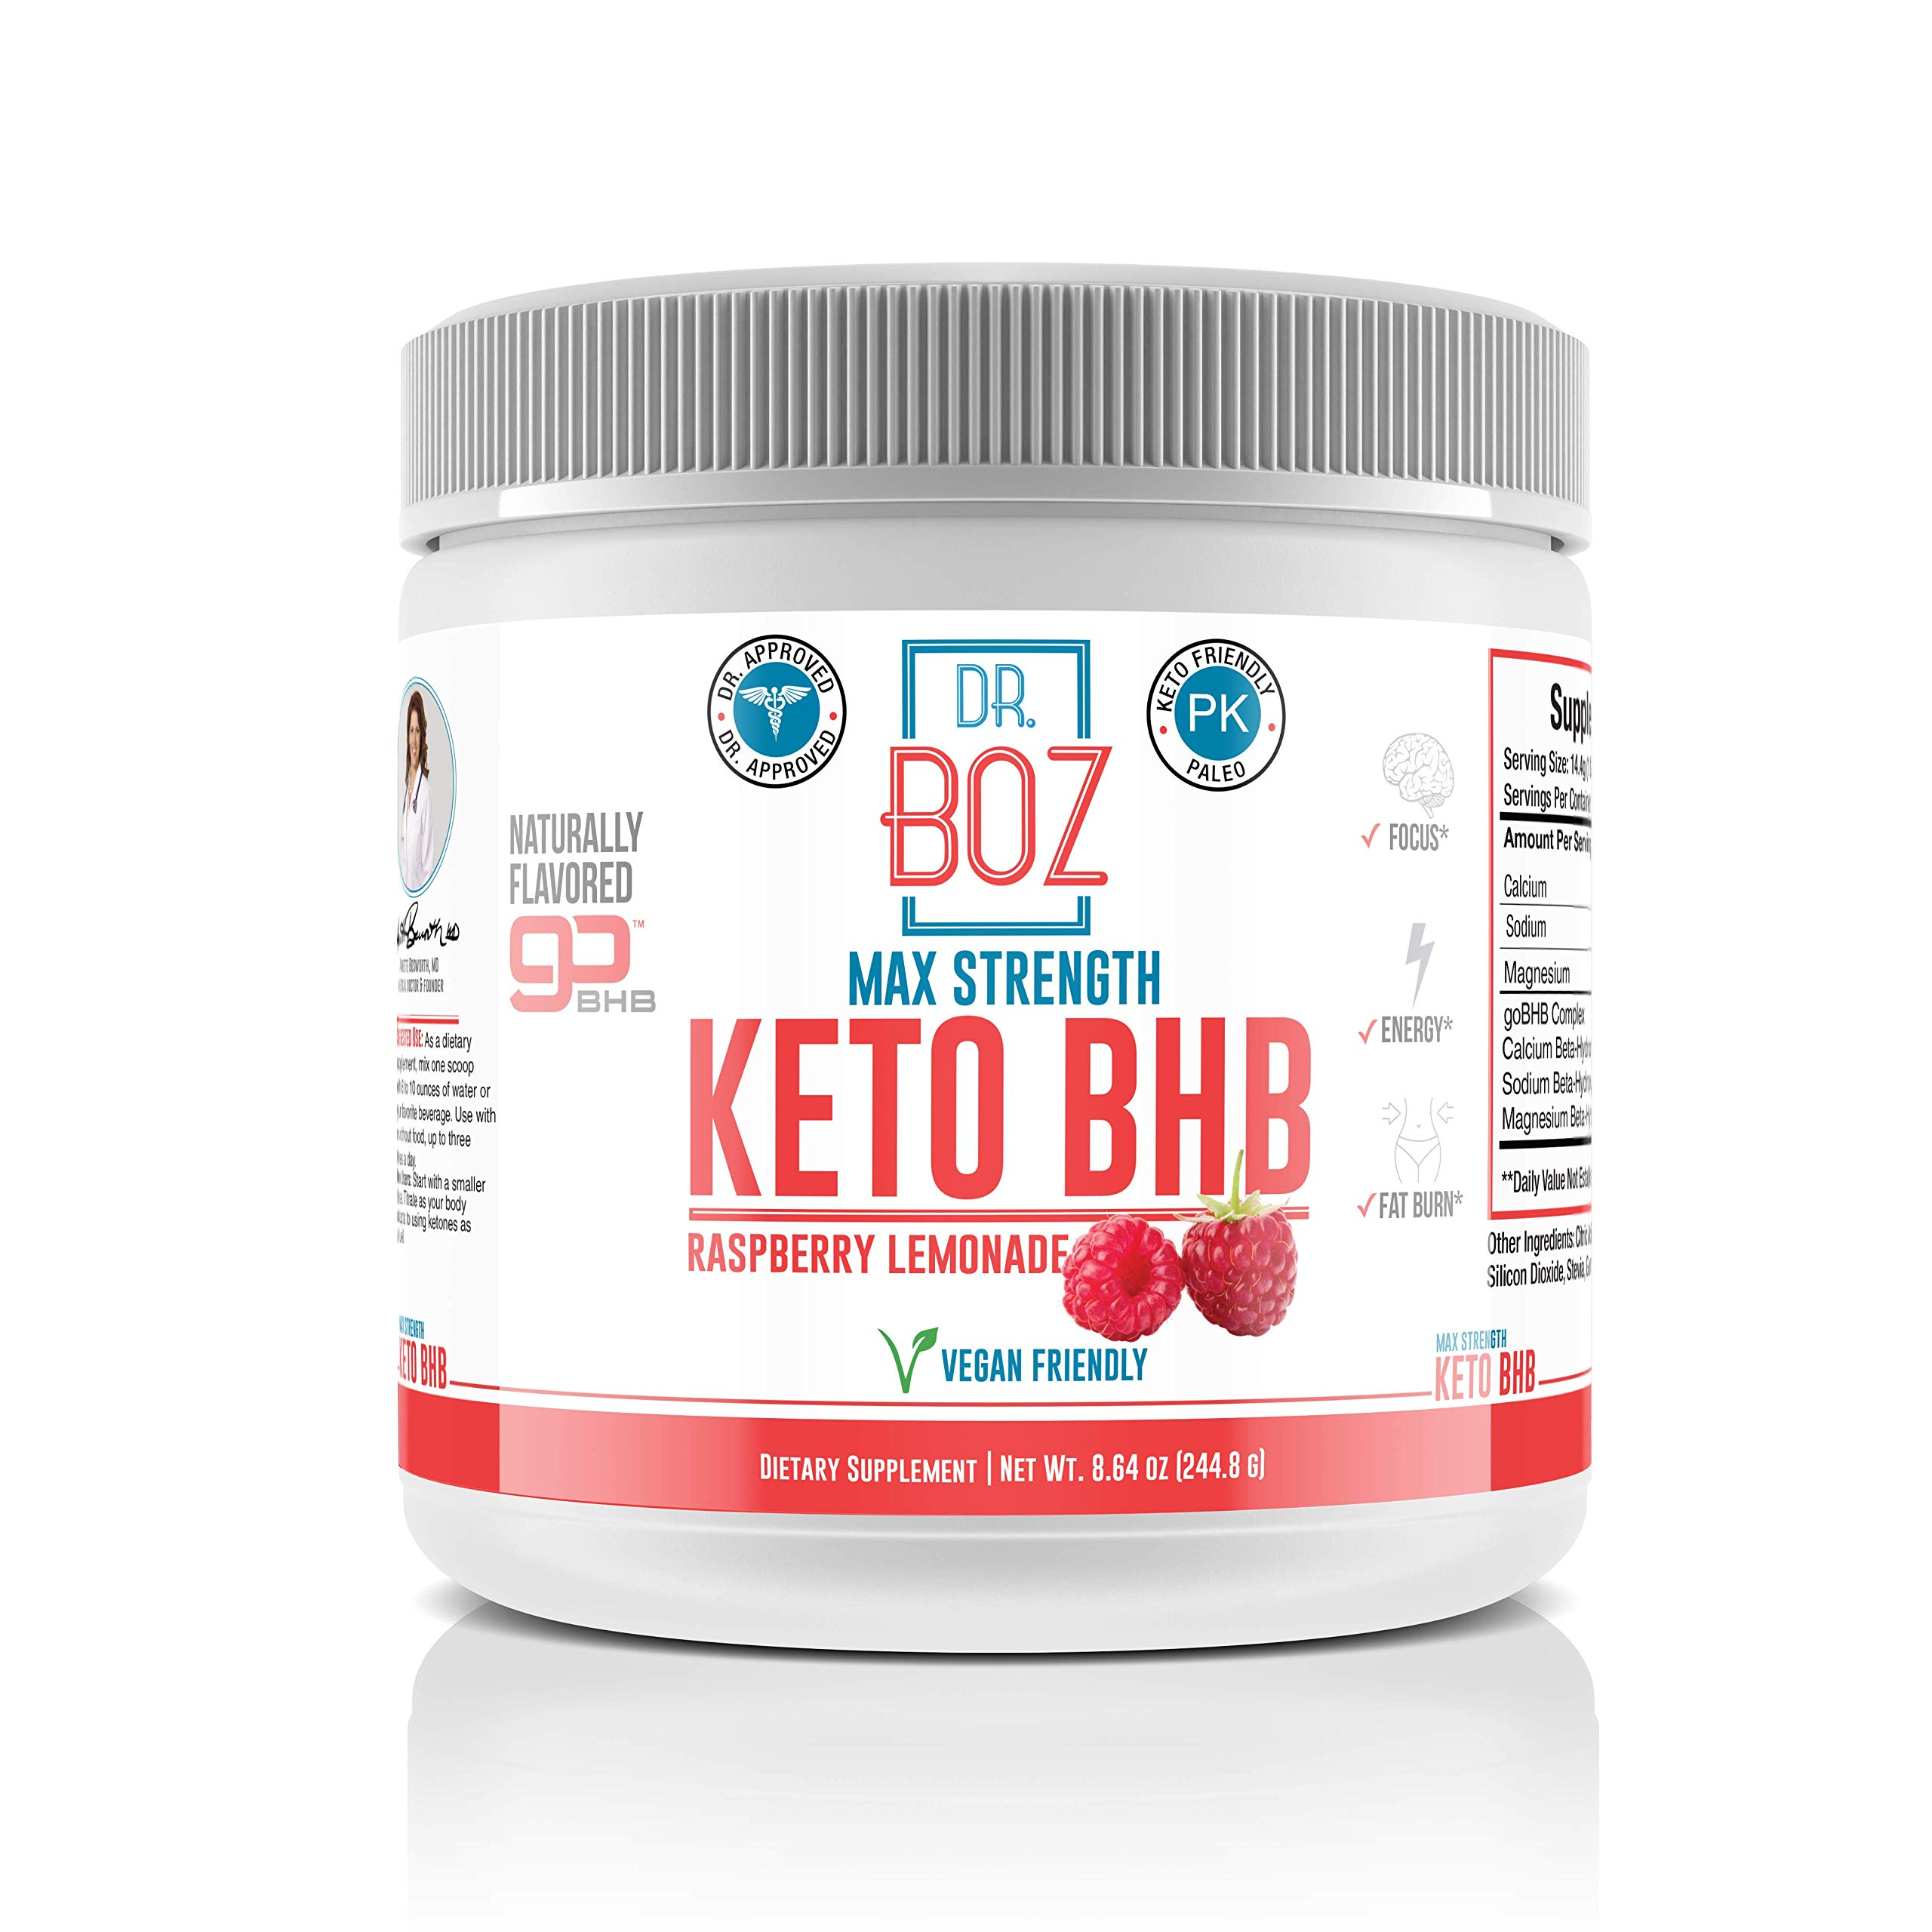 Dr. Boz Keto BHB Powder [Exogenous Ketones Supplement] -Best Keto Supplement for Weight Loss - Keto Supplement   Keto Shake - Keto Diet BHB Powder - [Raspberry Lemonade 244g] by Dr. Boz